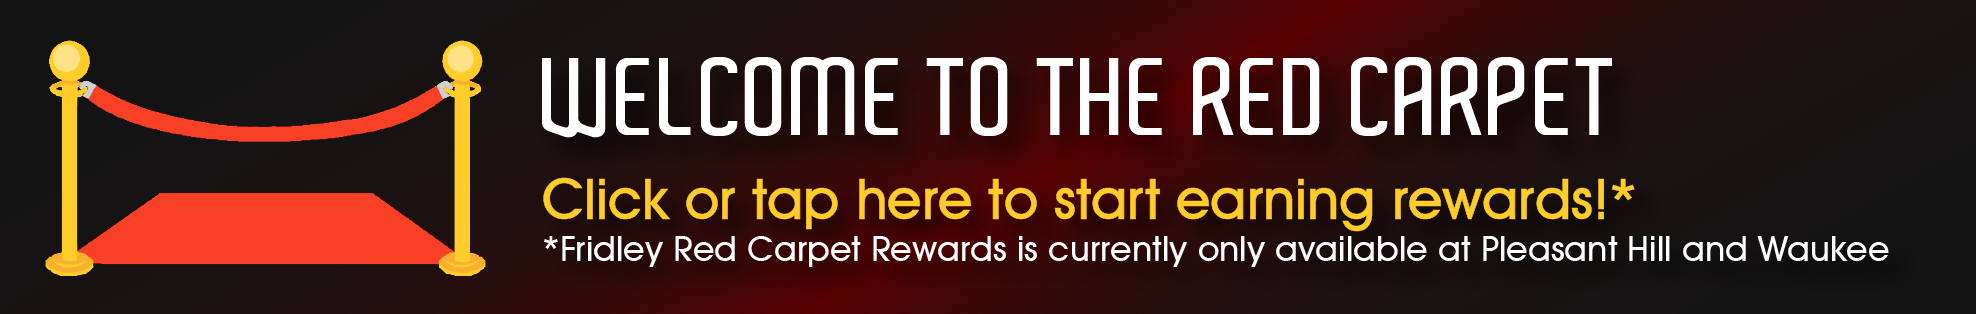 Red Carpet Rewards - click here